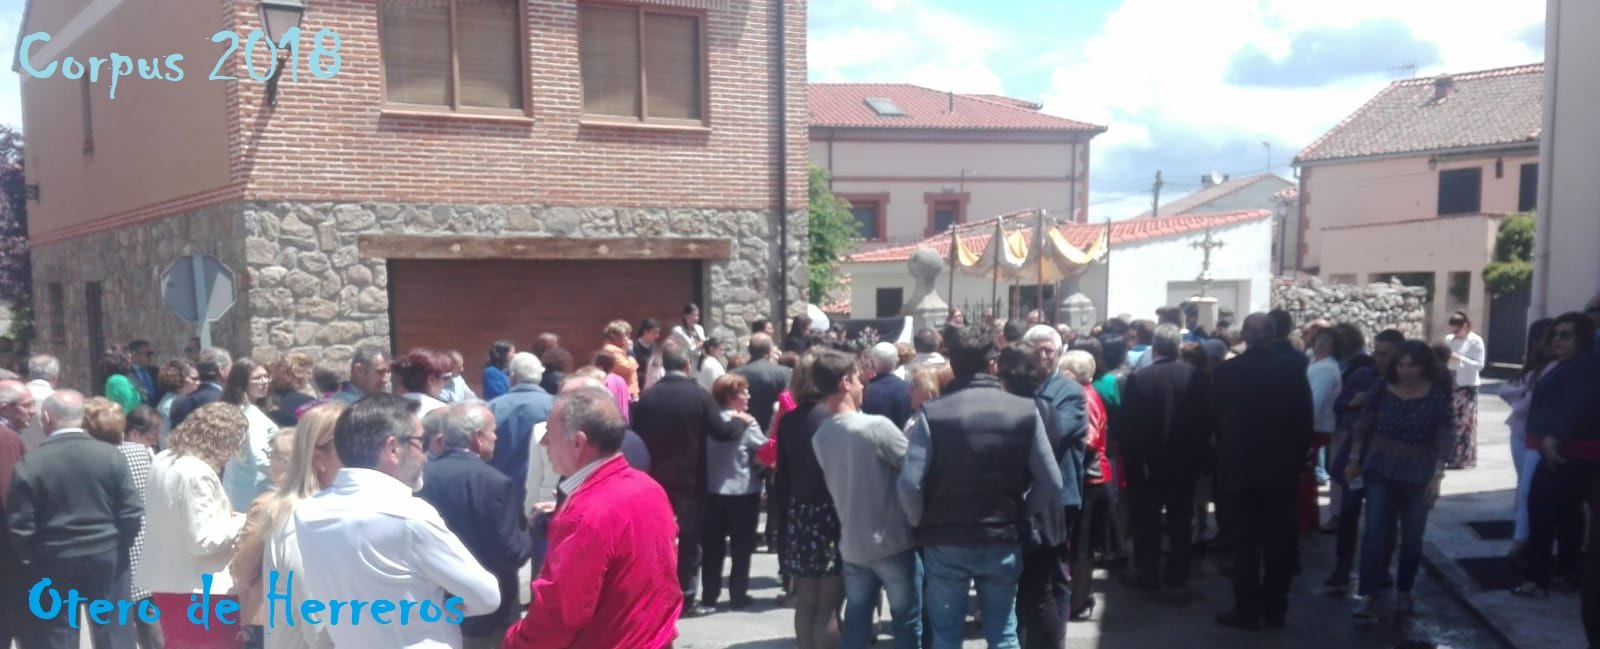 Fiestas Corpus 2018 (69)